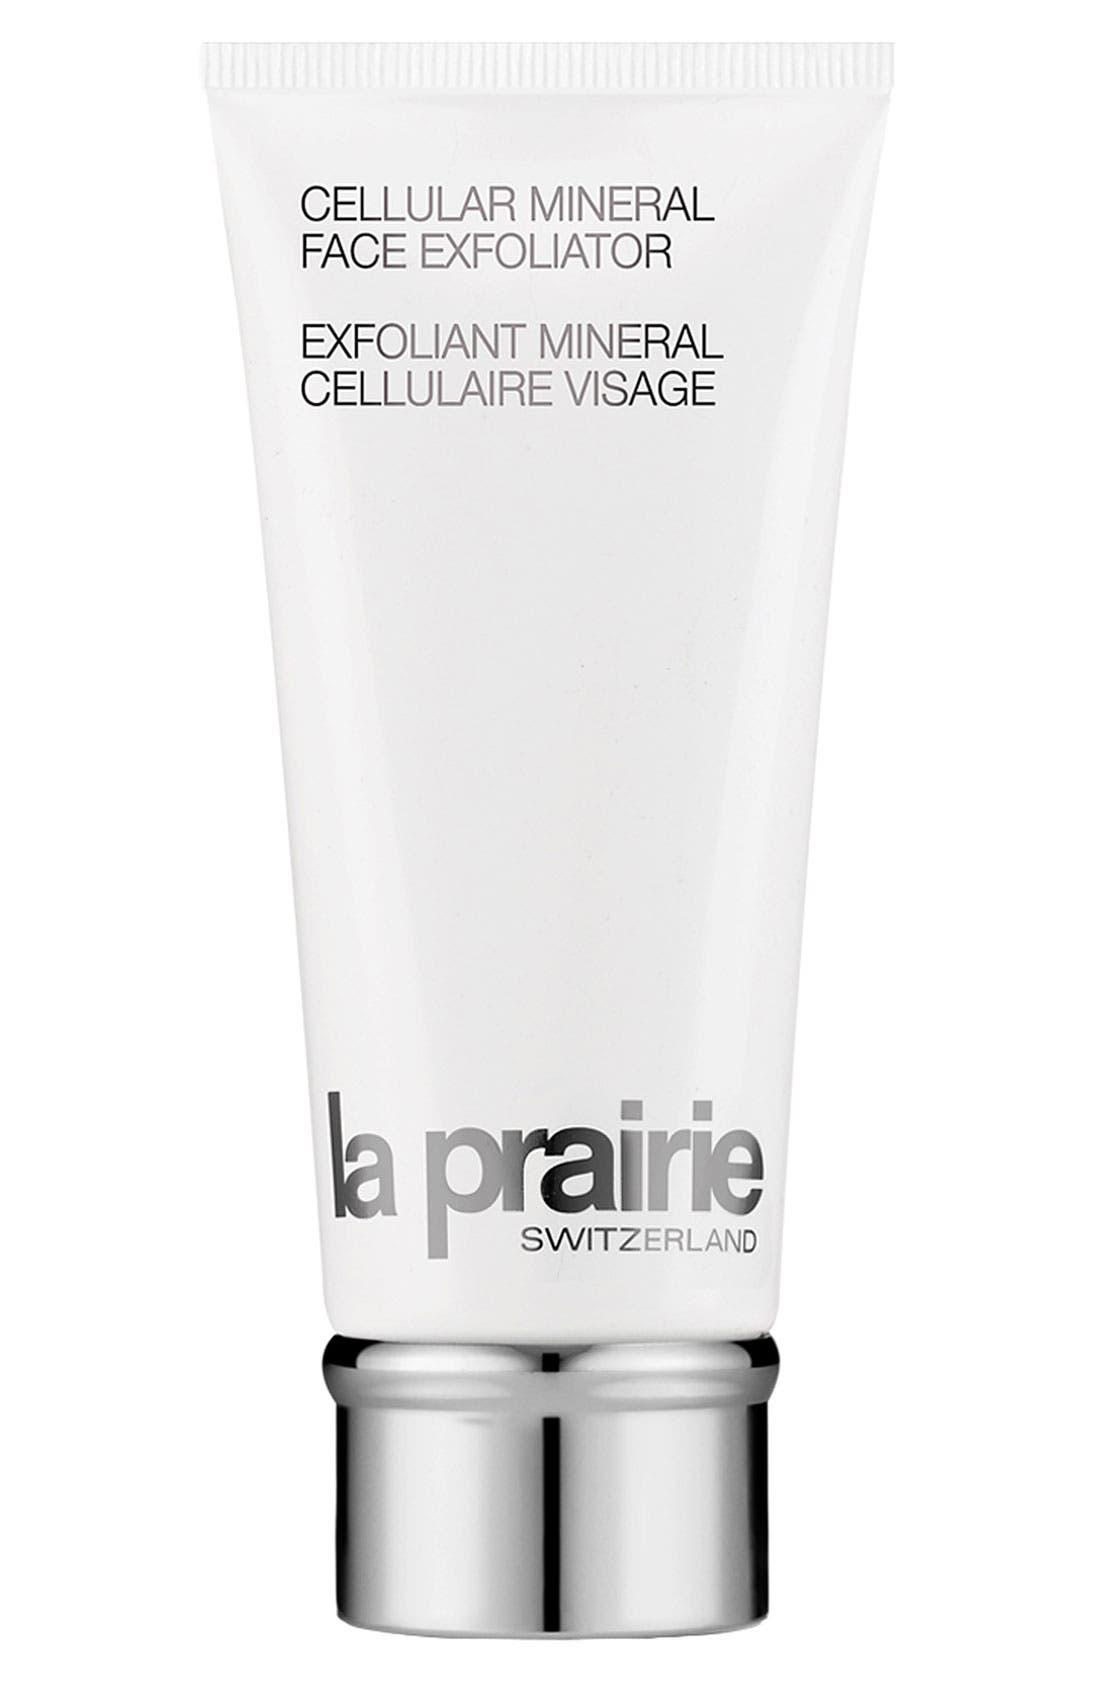 La Prairie 'Cellular Mineral' Face Exfoliator